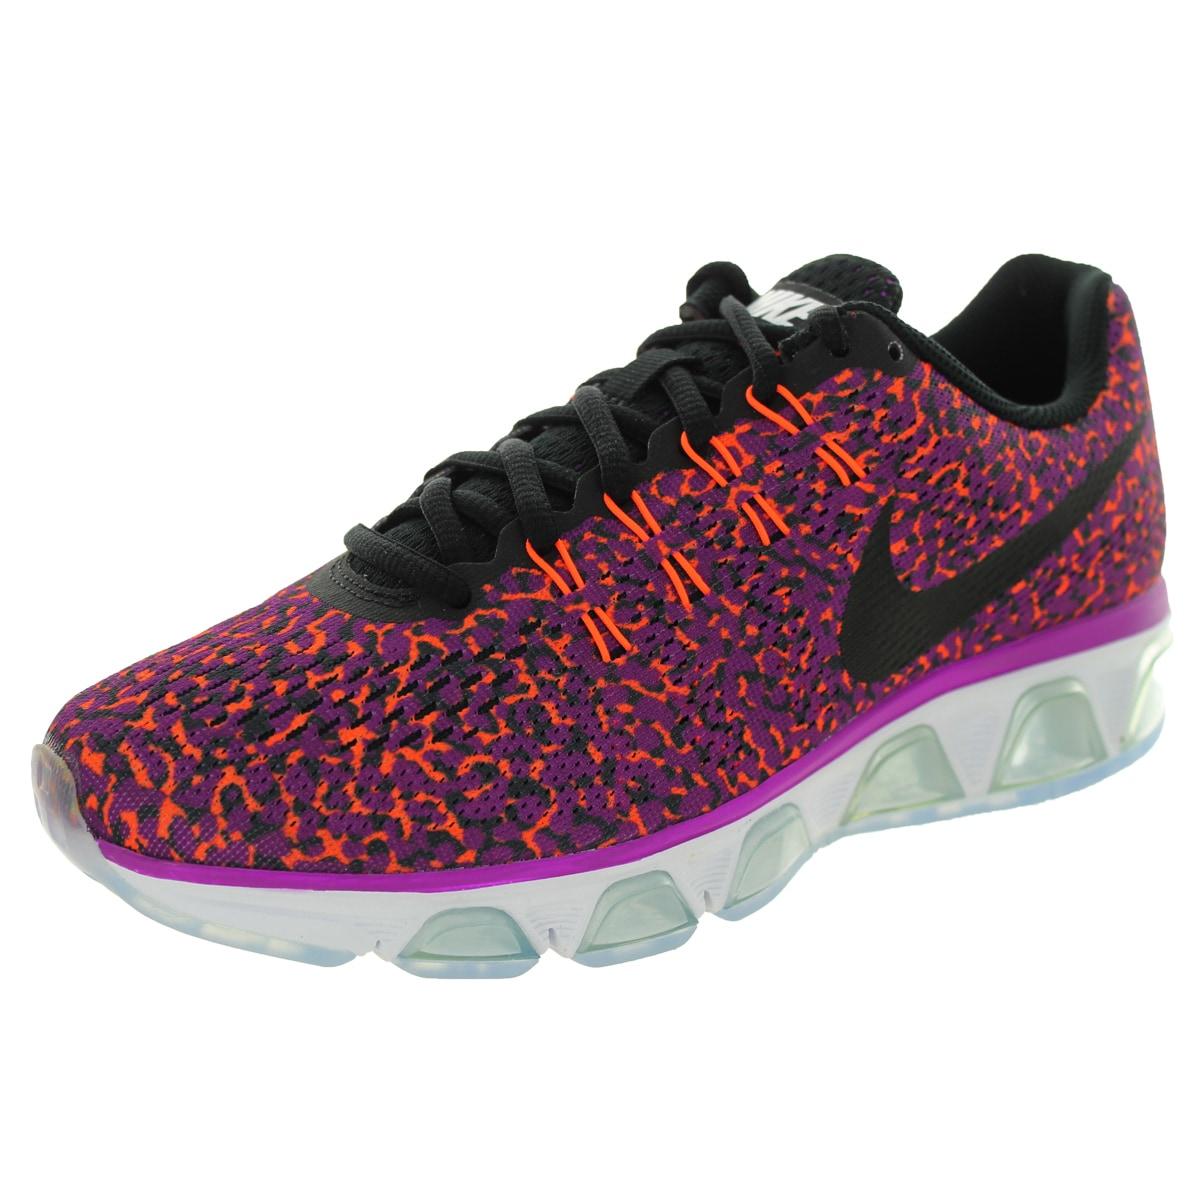 Nike Women's Air Max Tailwind 8 Vvd Purple/White/Black/ O...